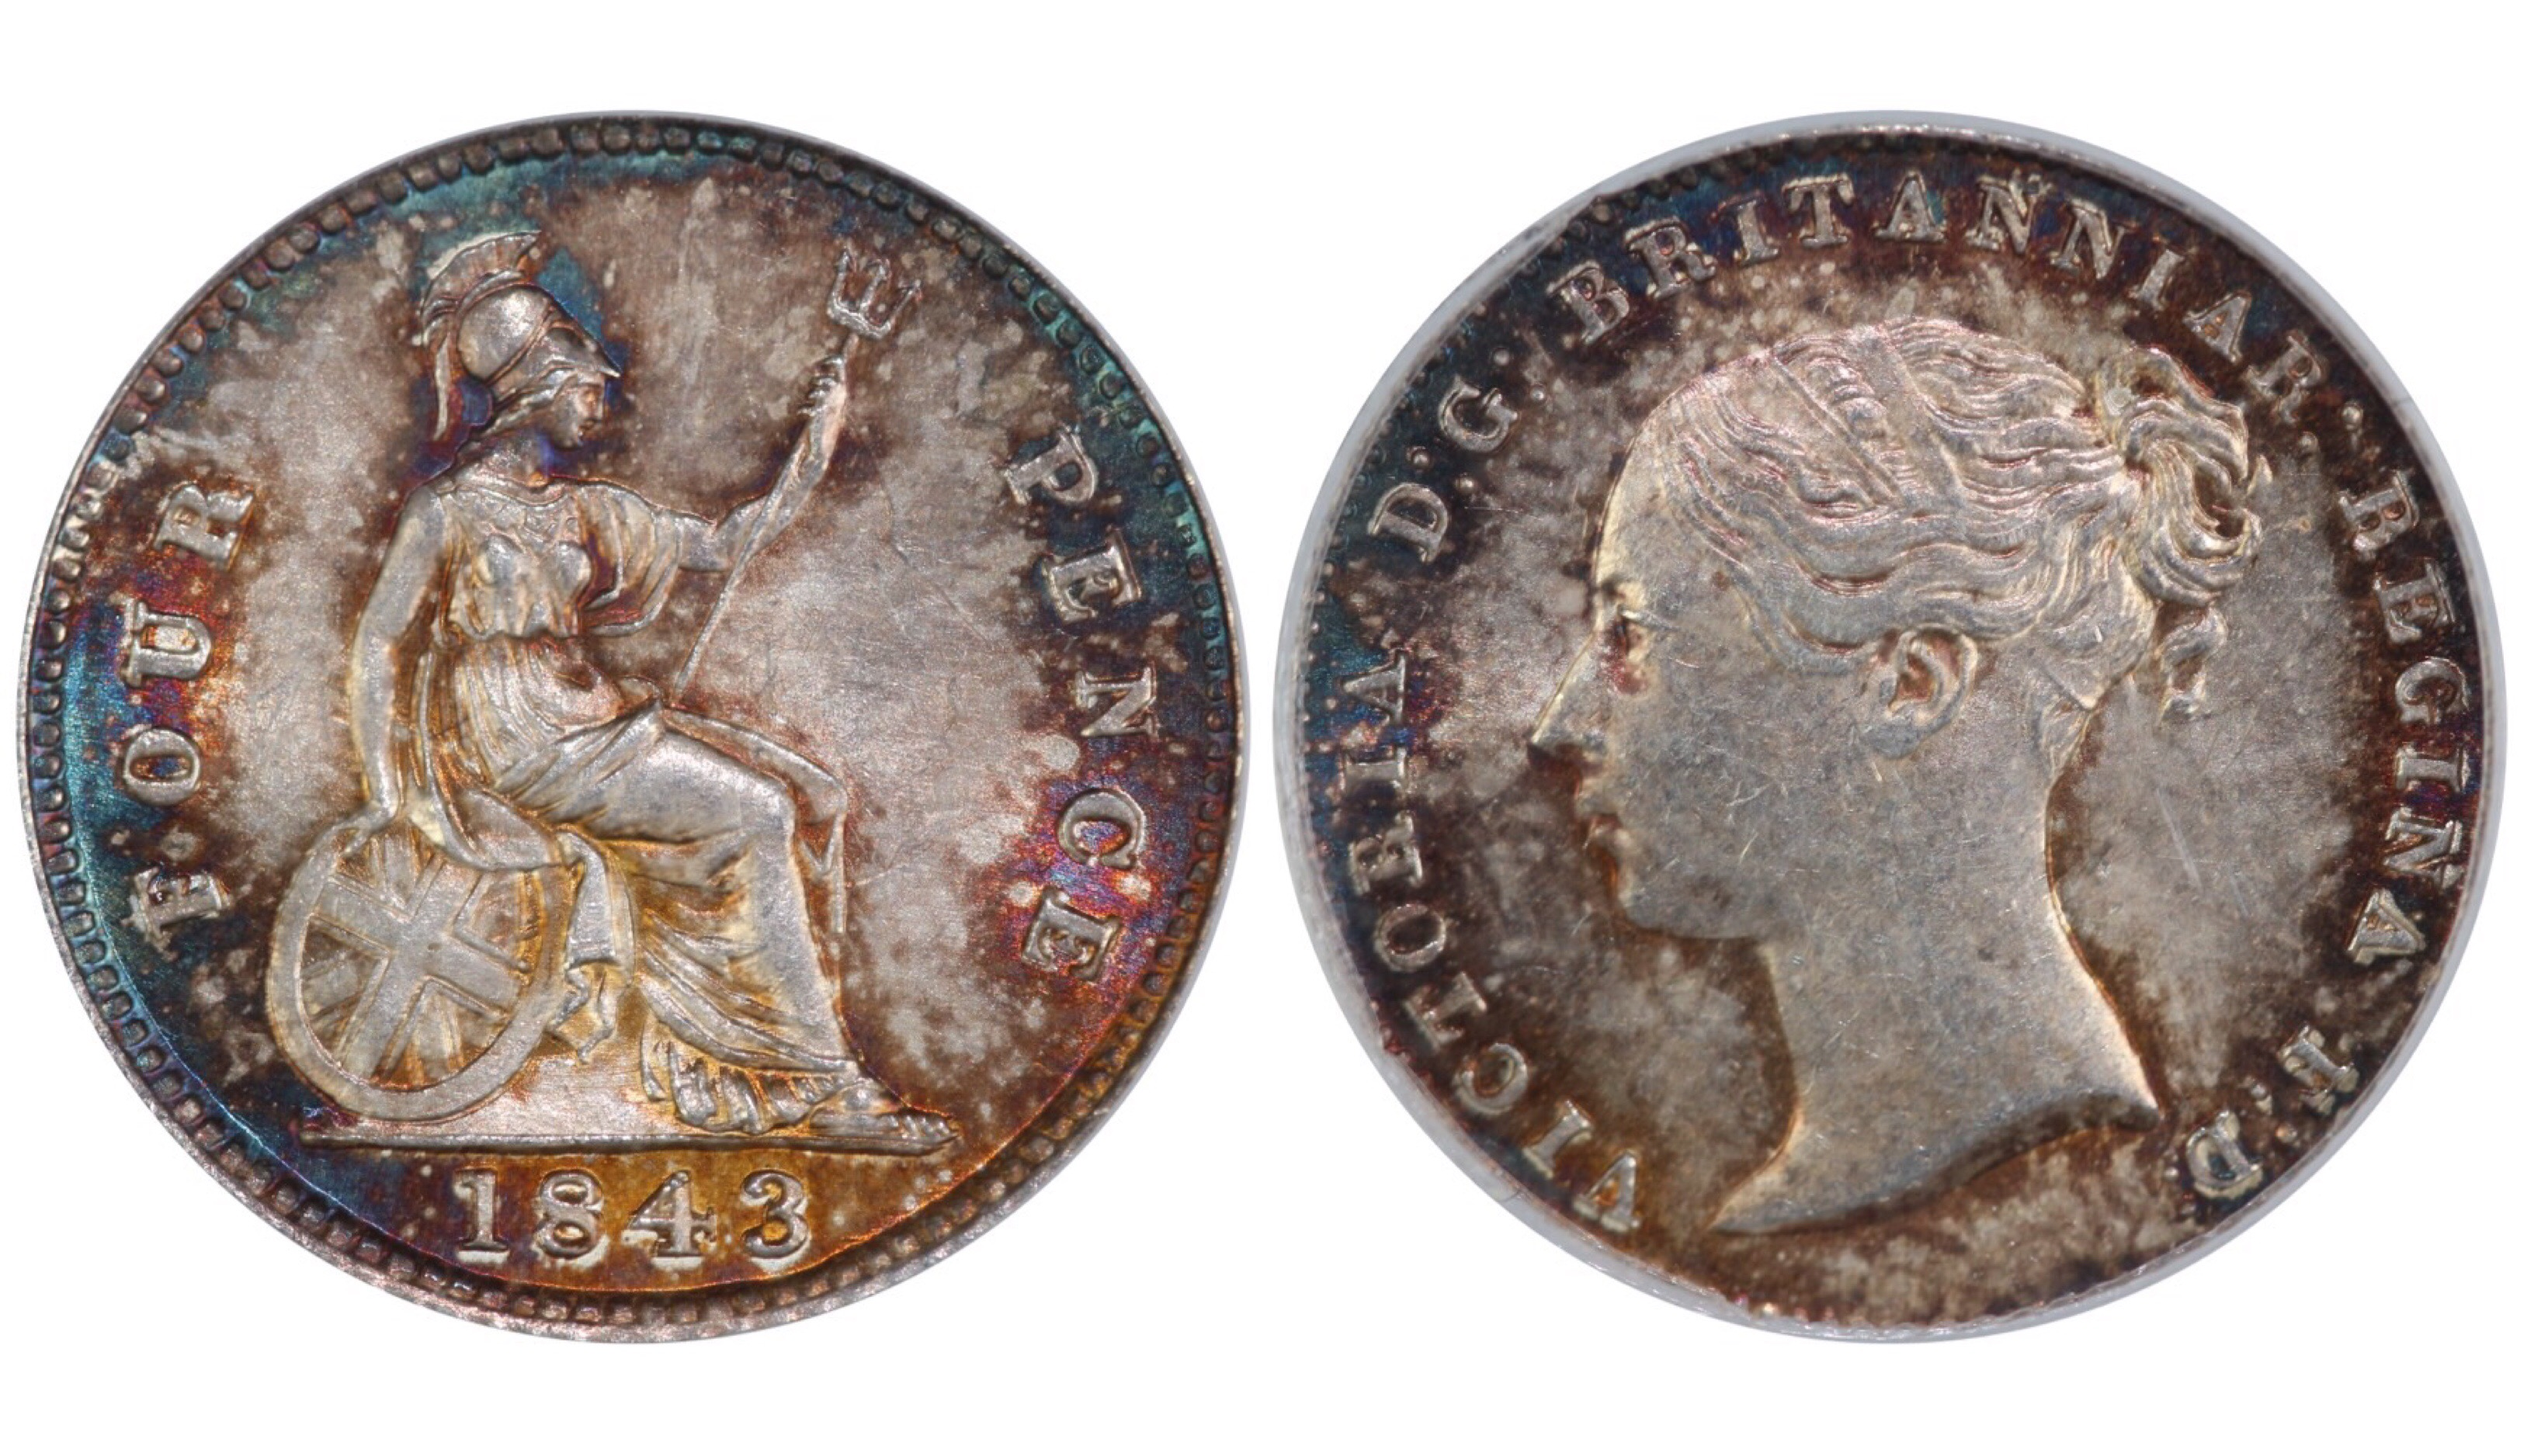 1843 Groat, CGS 78, Victoria, ESC 1938,